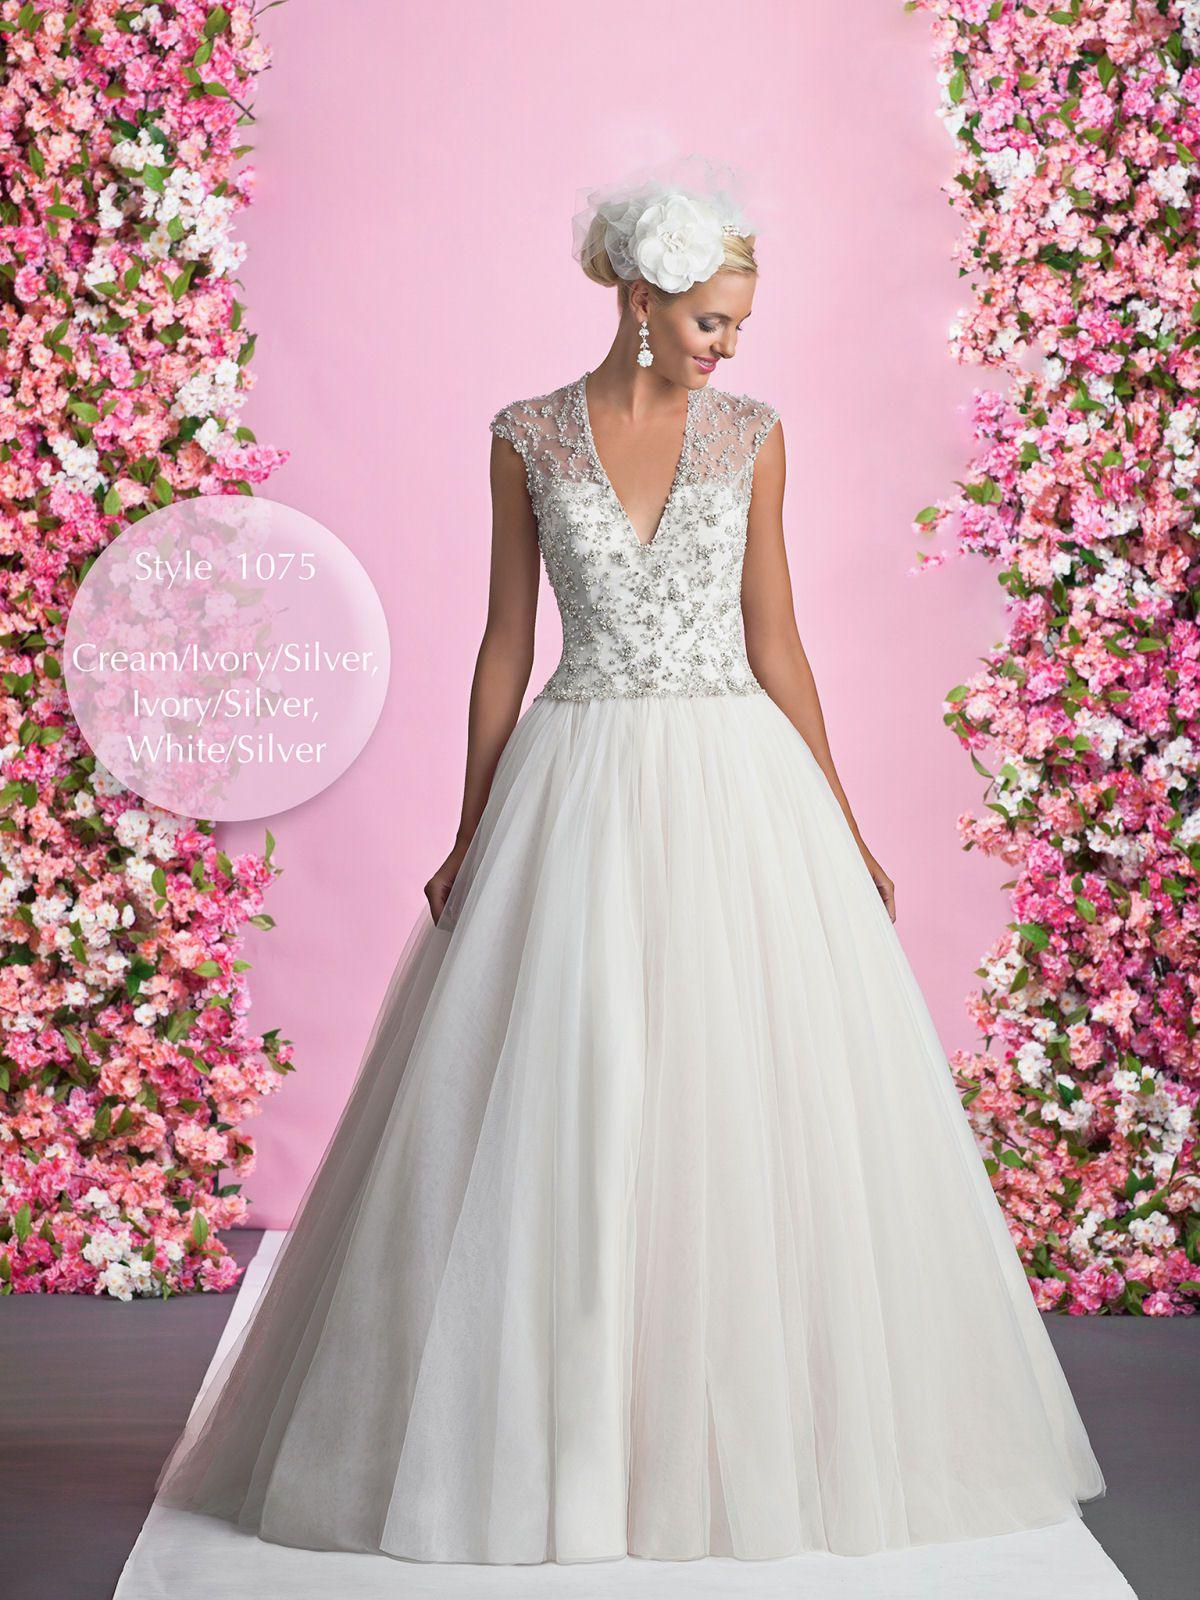 Bonito Vestido De La Dama De Honor Jessica Mcclintock Foto - Ideas ...